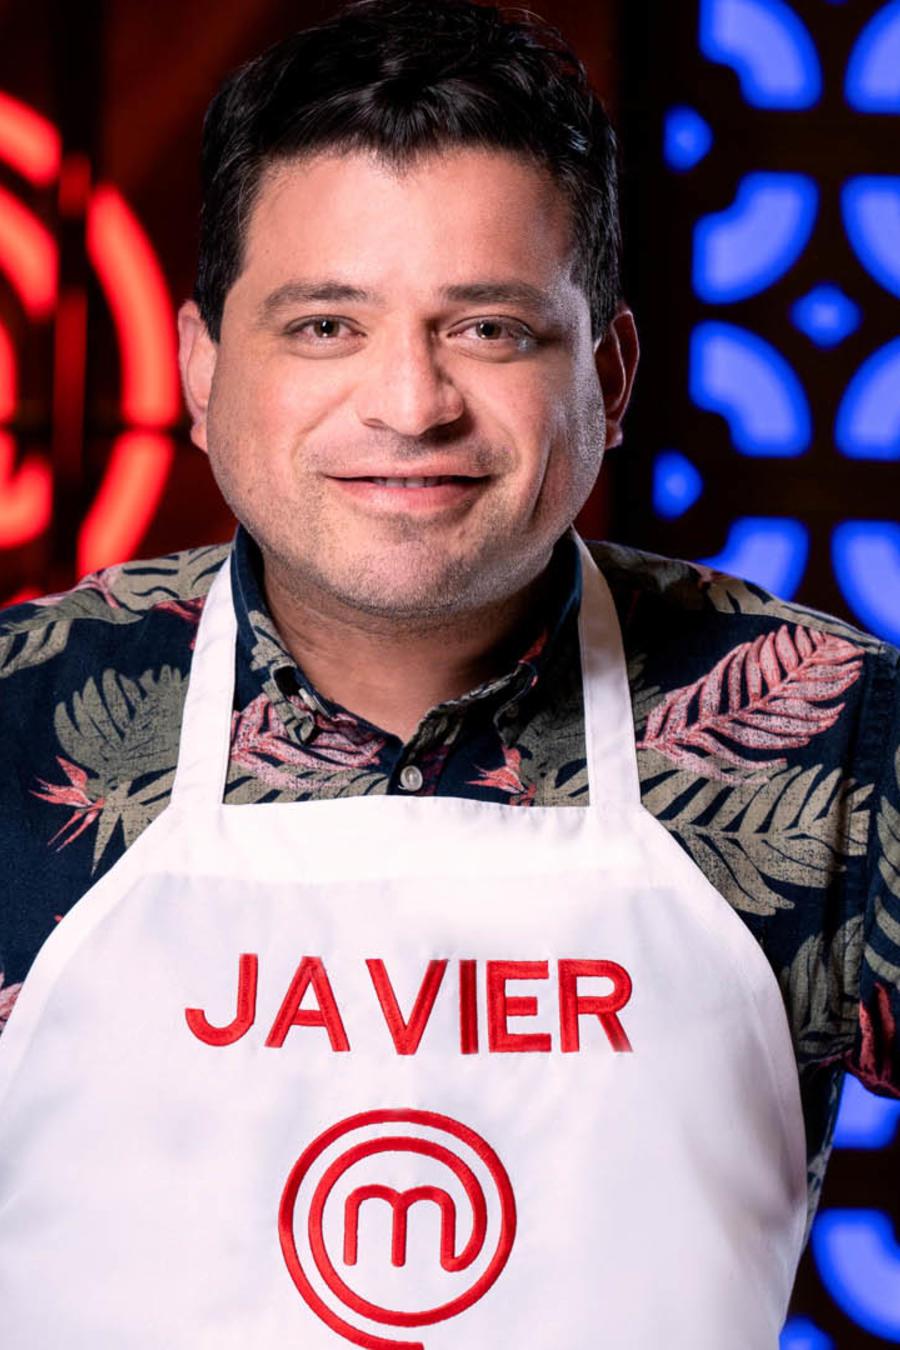 Javier Seañez, finalista de MasterChef Latino 2